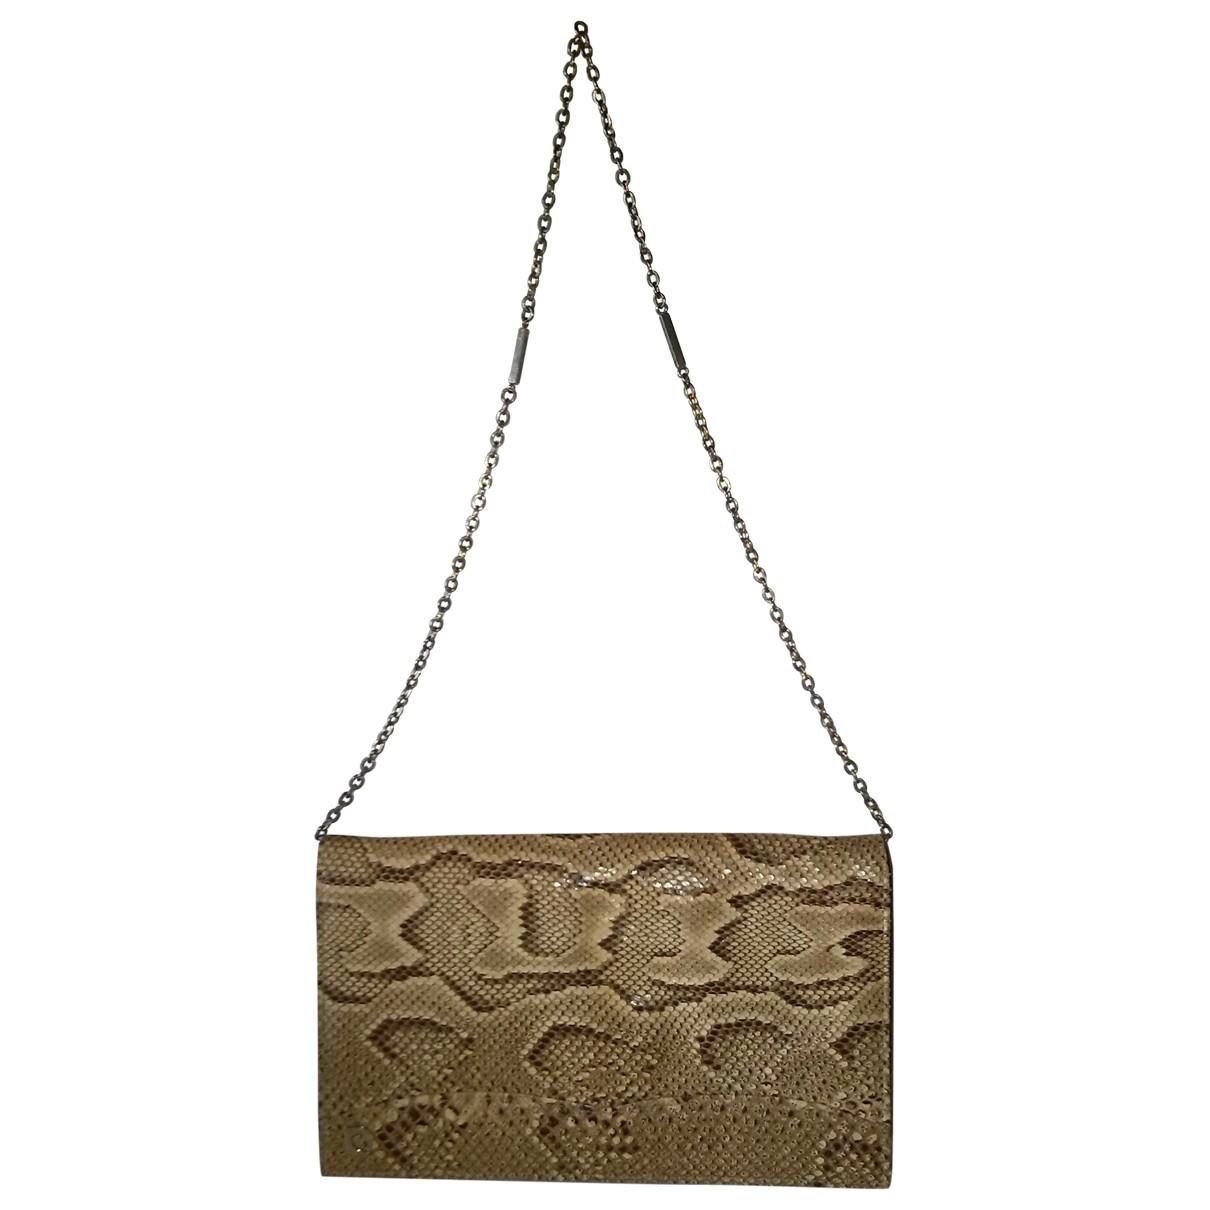 Pierre Cardin \N Brown Python Clutch bag for Women \N